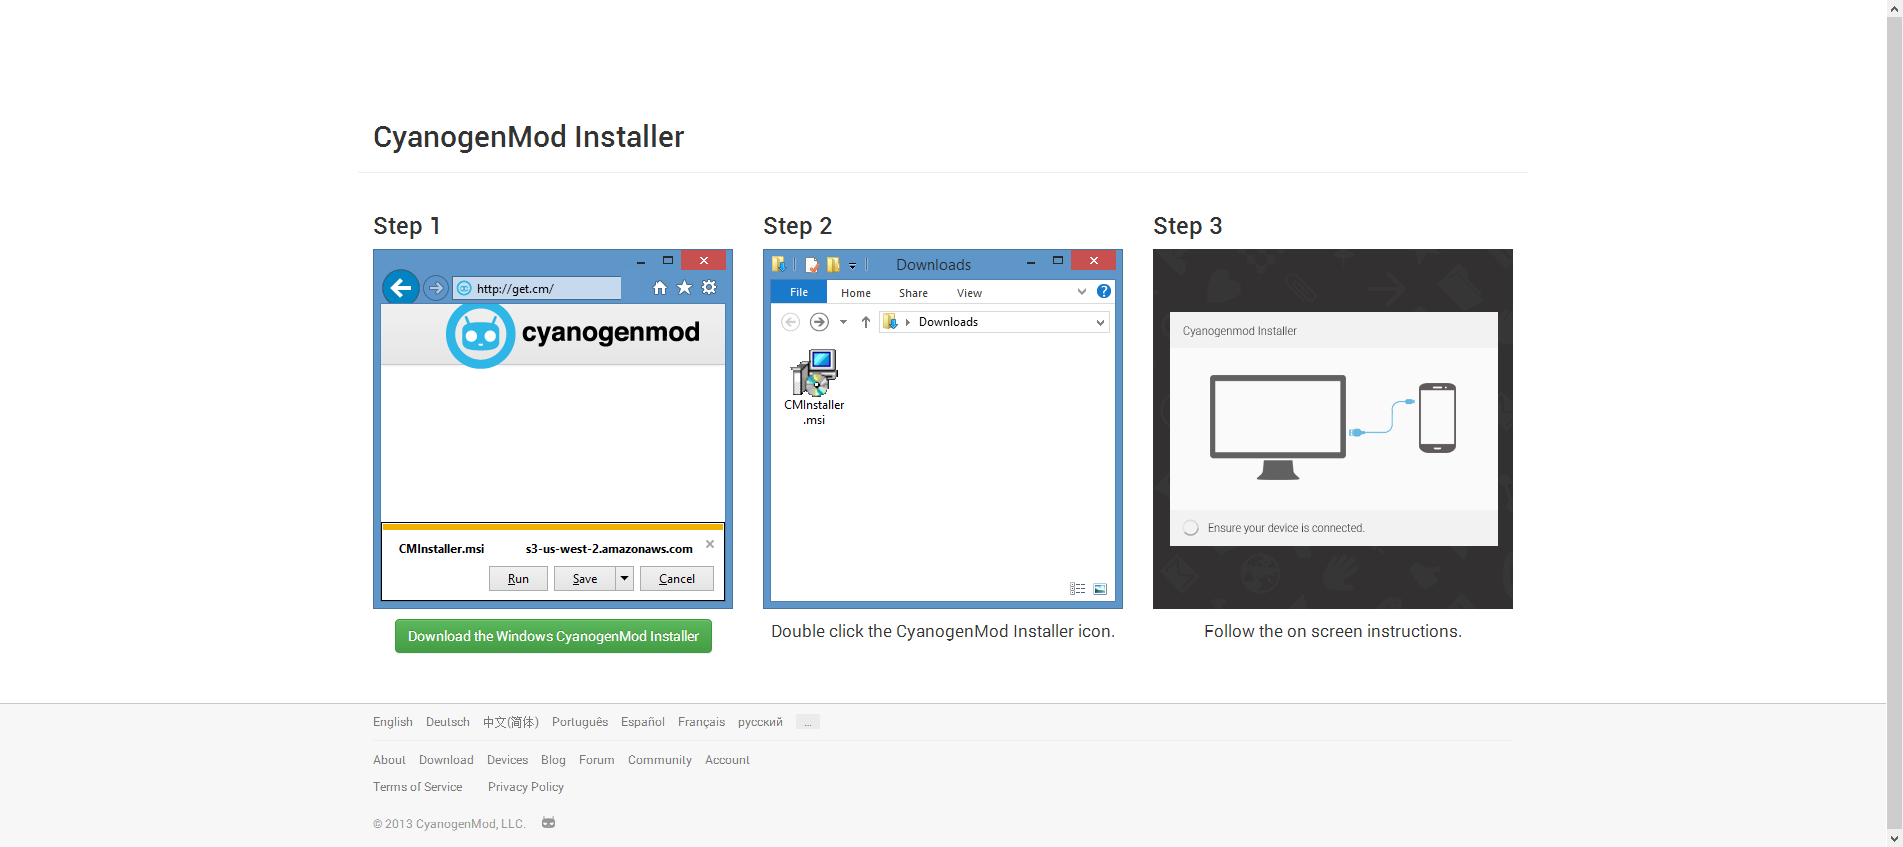 Hands-On With CyanogenMod Installer